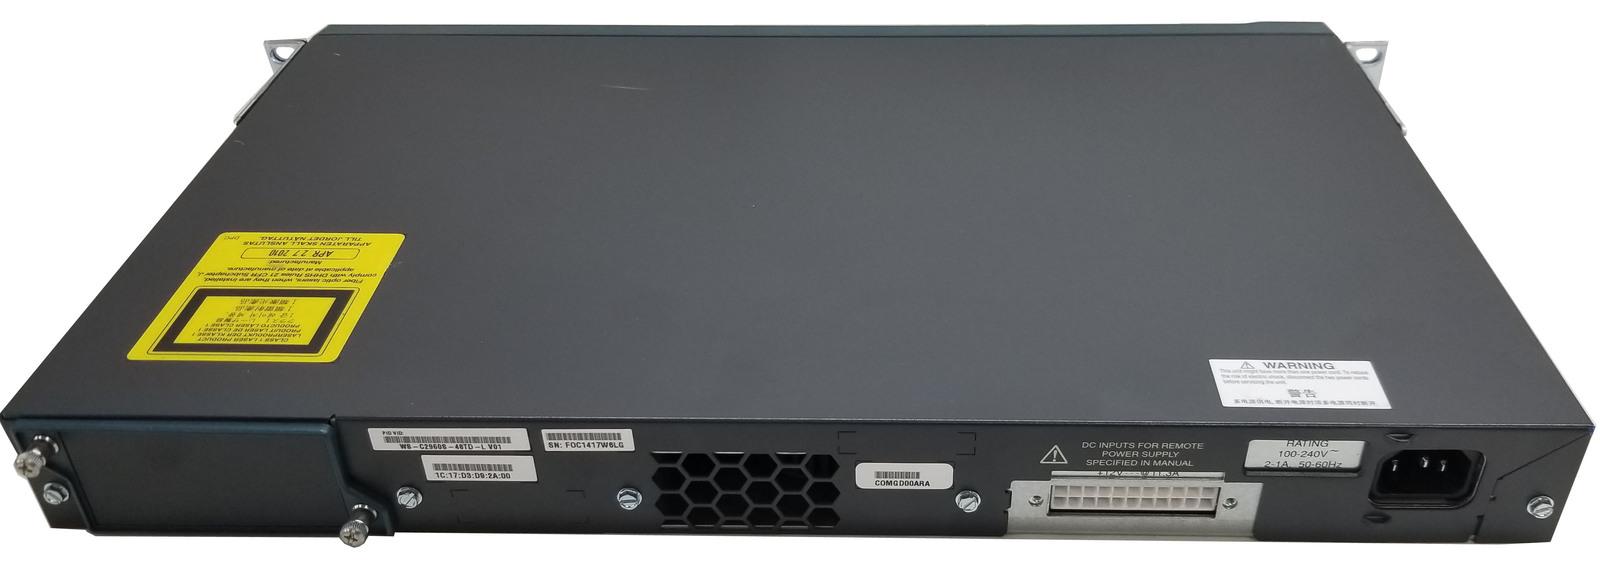 Cisco WS-C2960S-48TD-L V01 Catalyst 48 Port 2960-S GE Switch Bin:6